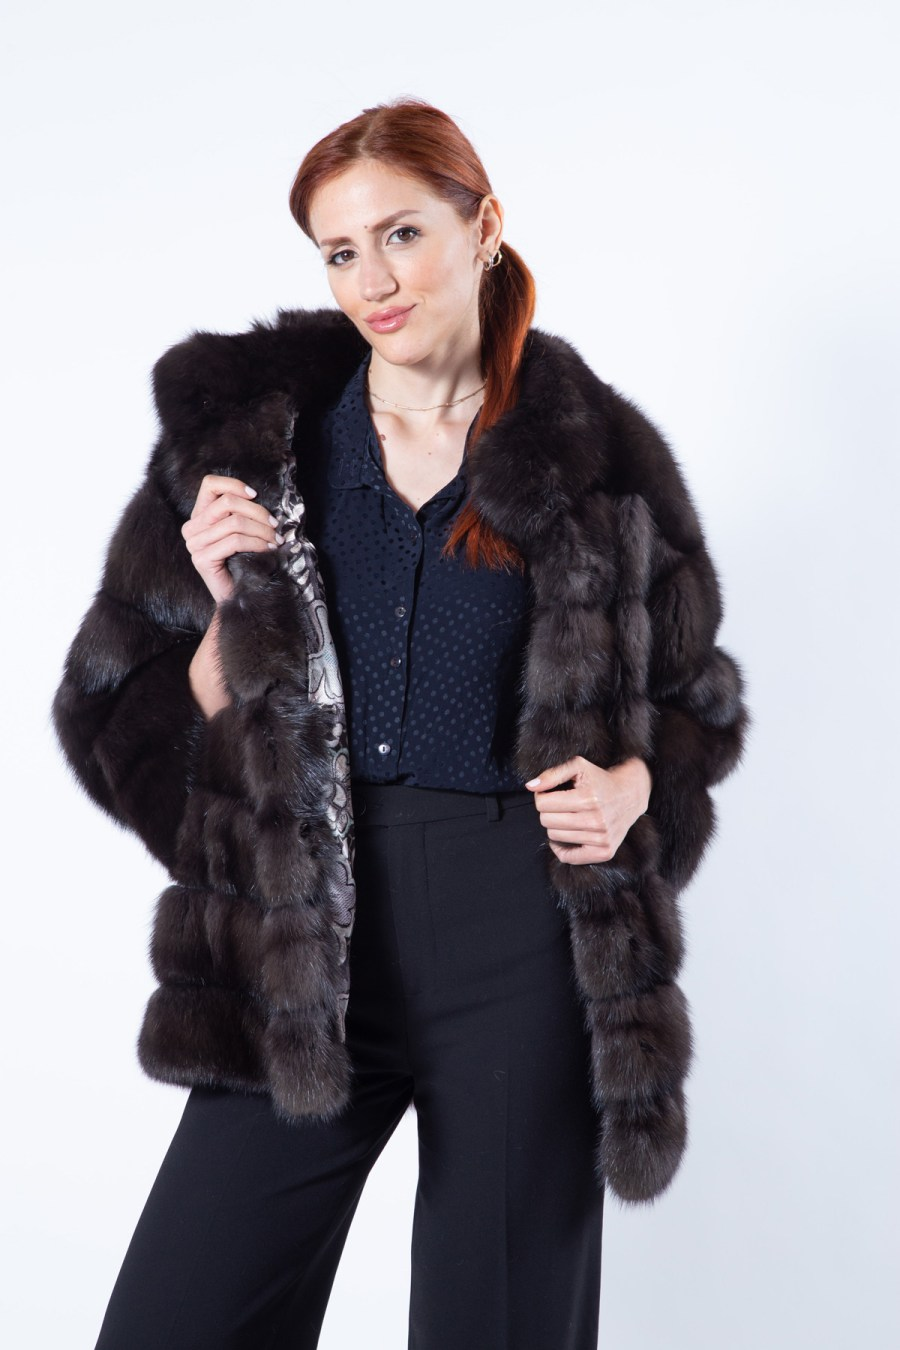 Barguzin Sable Jacket with 7/8 Sleeves | Пальто из меха баргузинского соболя с рукавами 7/8 - Sarigianni Furs